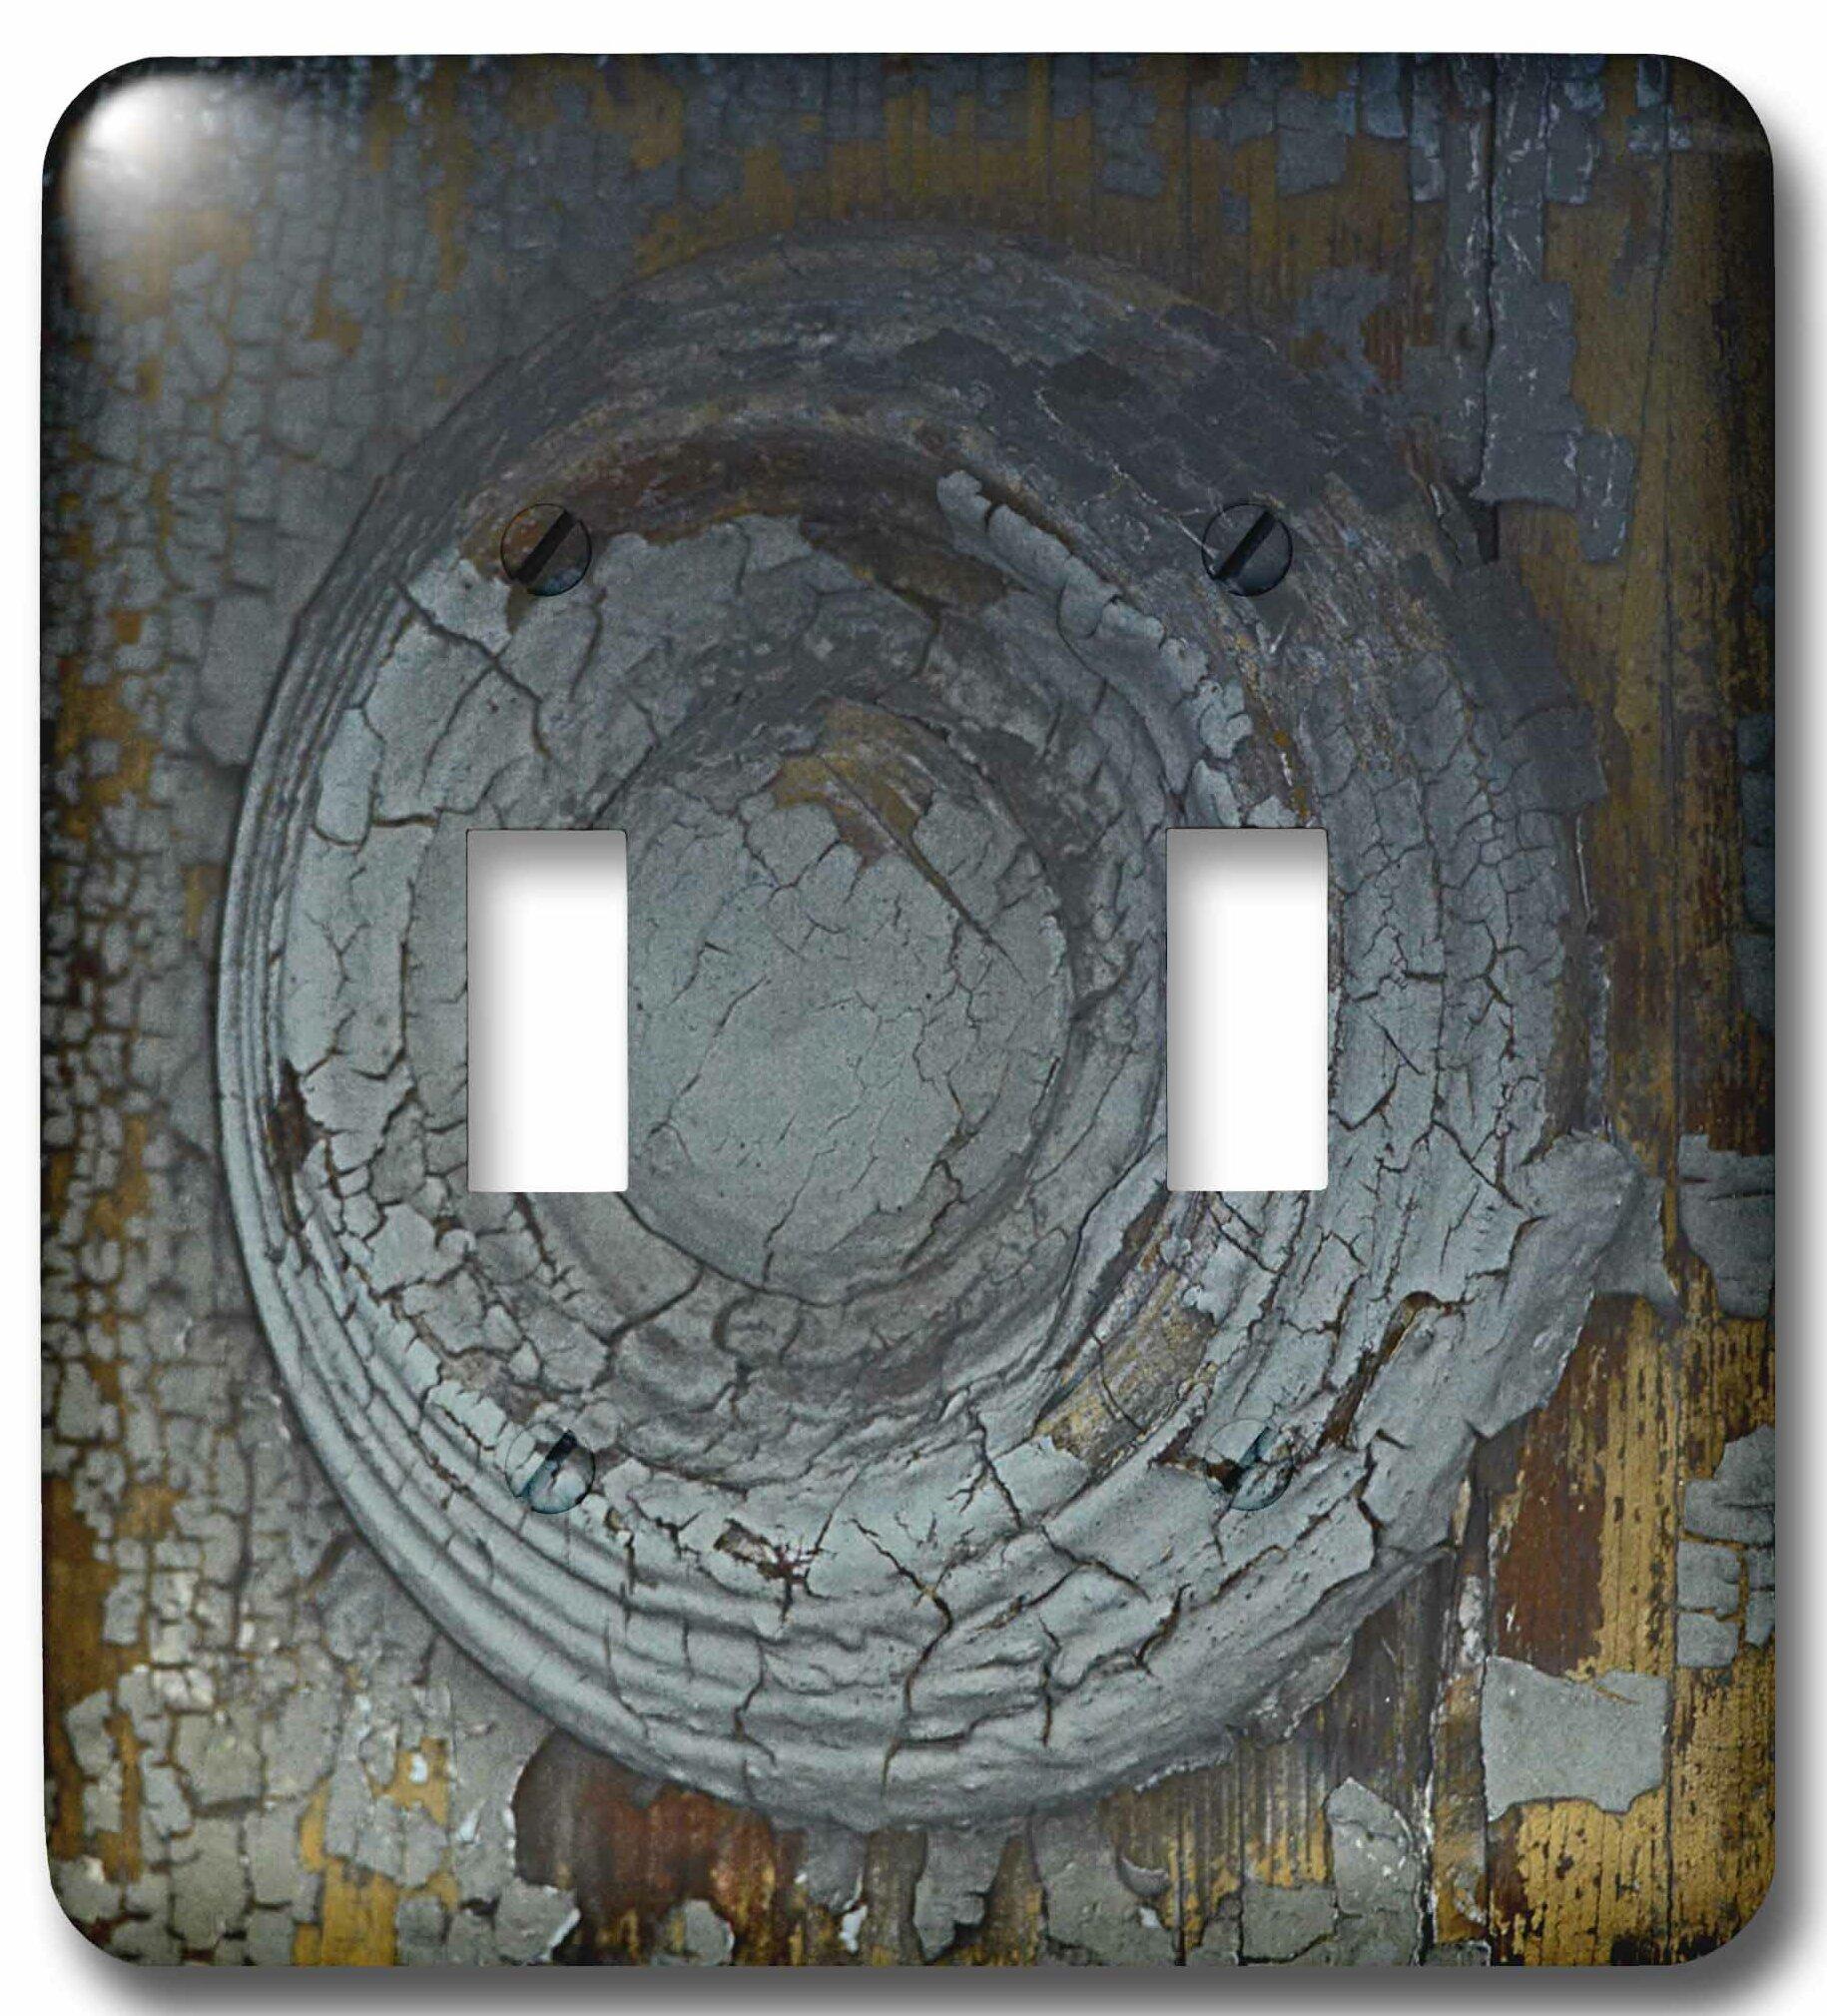 3drose Decorative Oval 2 Gang Toggle Light Switch Wall Plate Wayfair